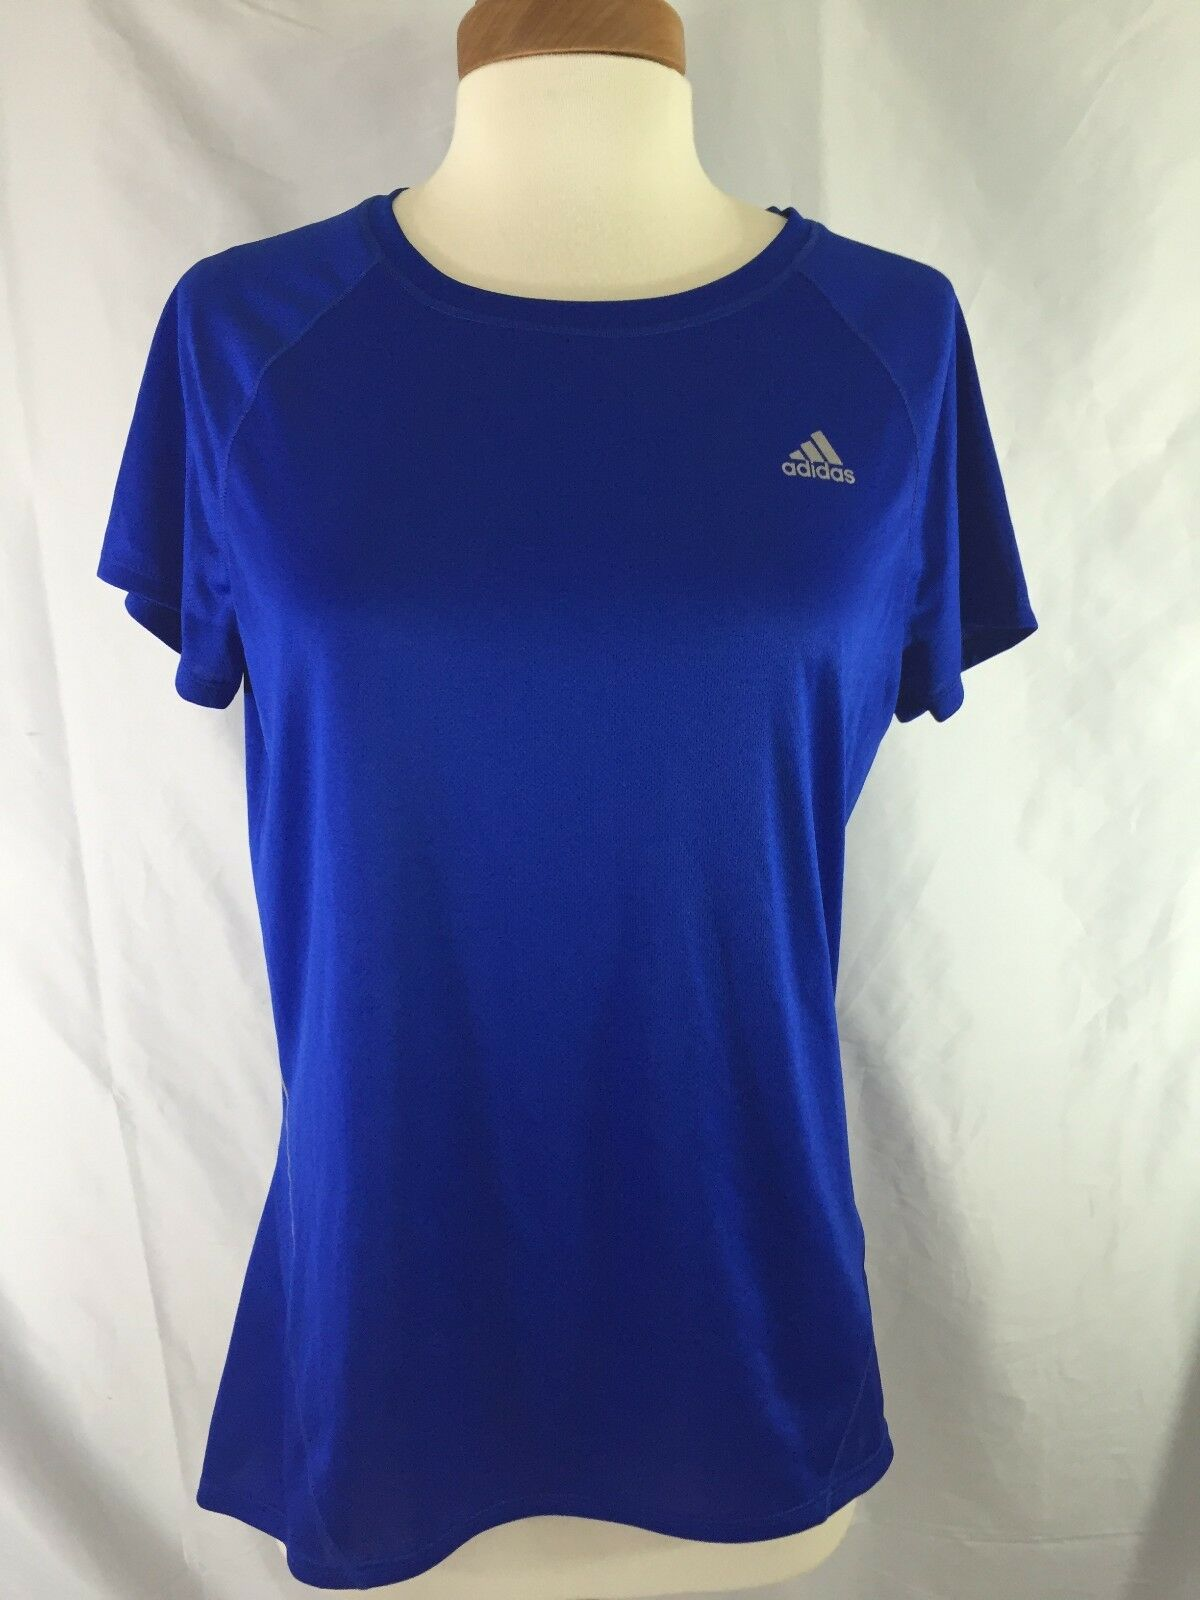 Chemise Adidas Exercice Bleu Adidas Climalite pour Femme, Taille M